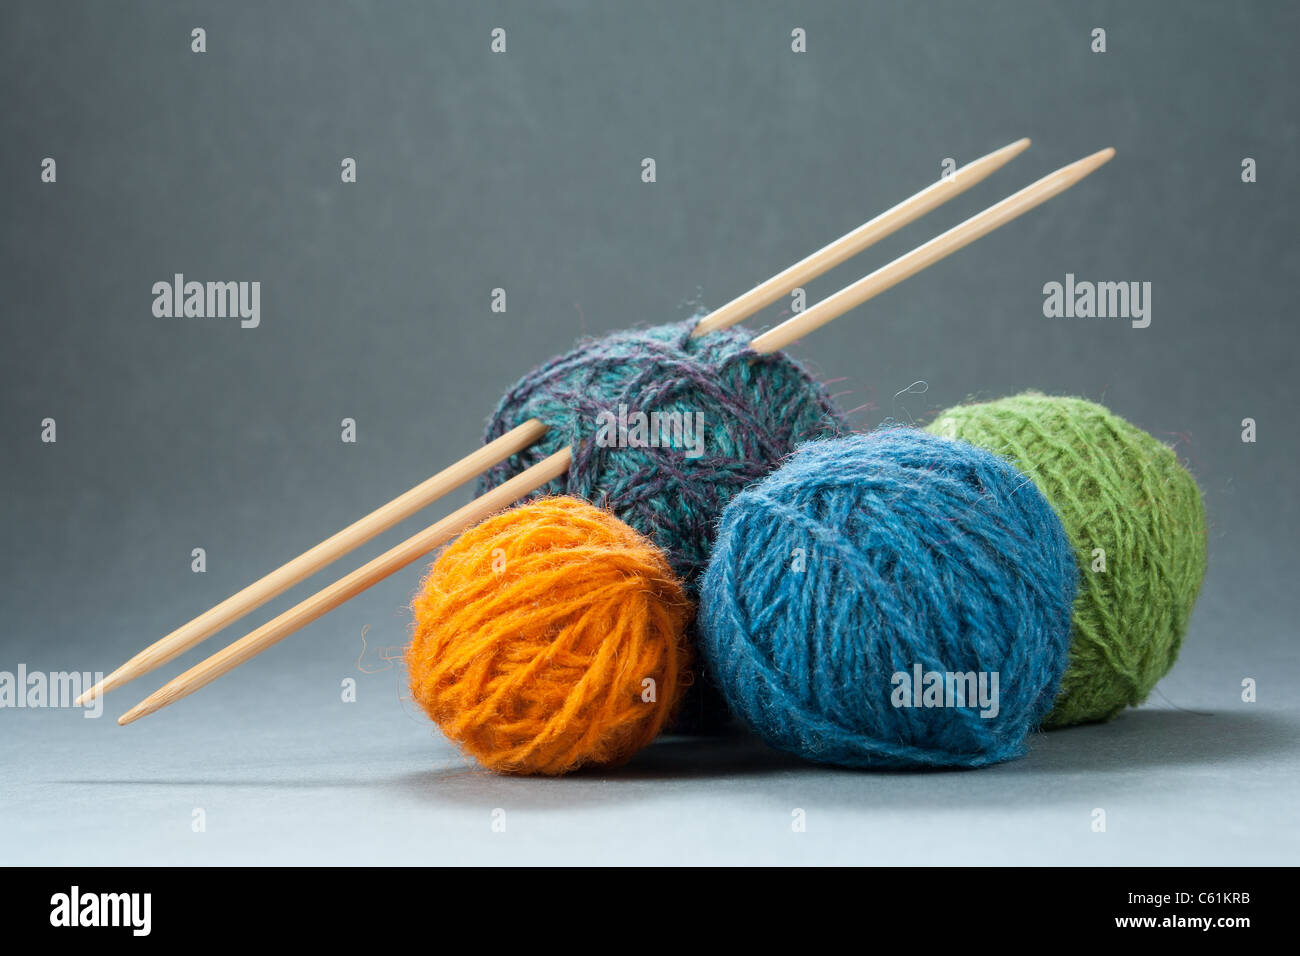 Selection of Yarn Balls with Bamboo Needles - Stock Image